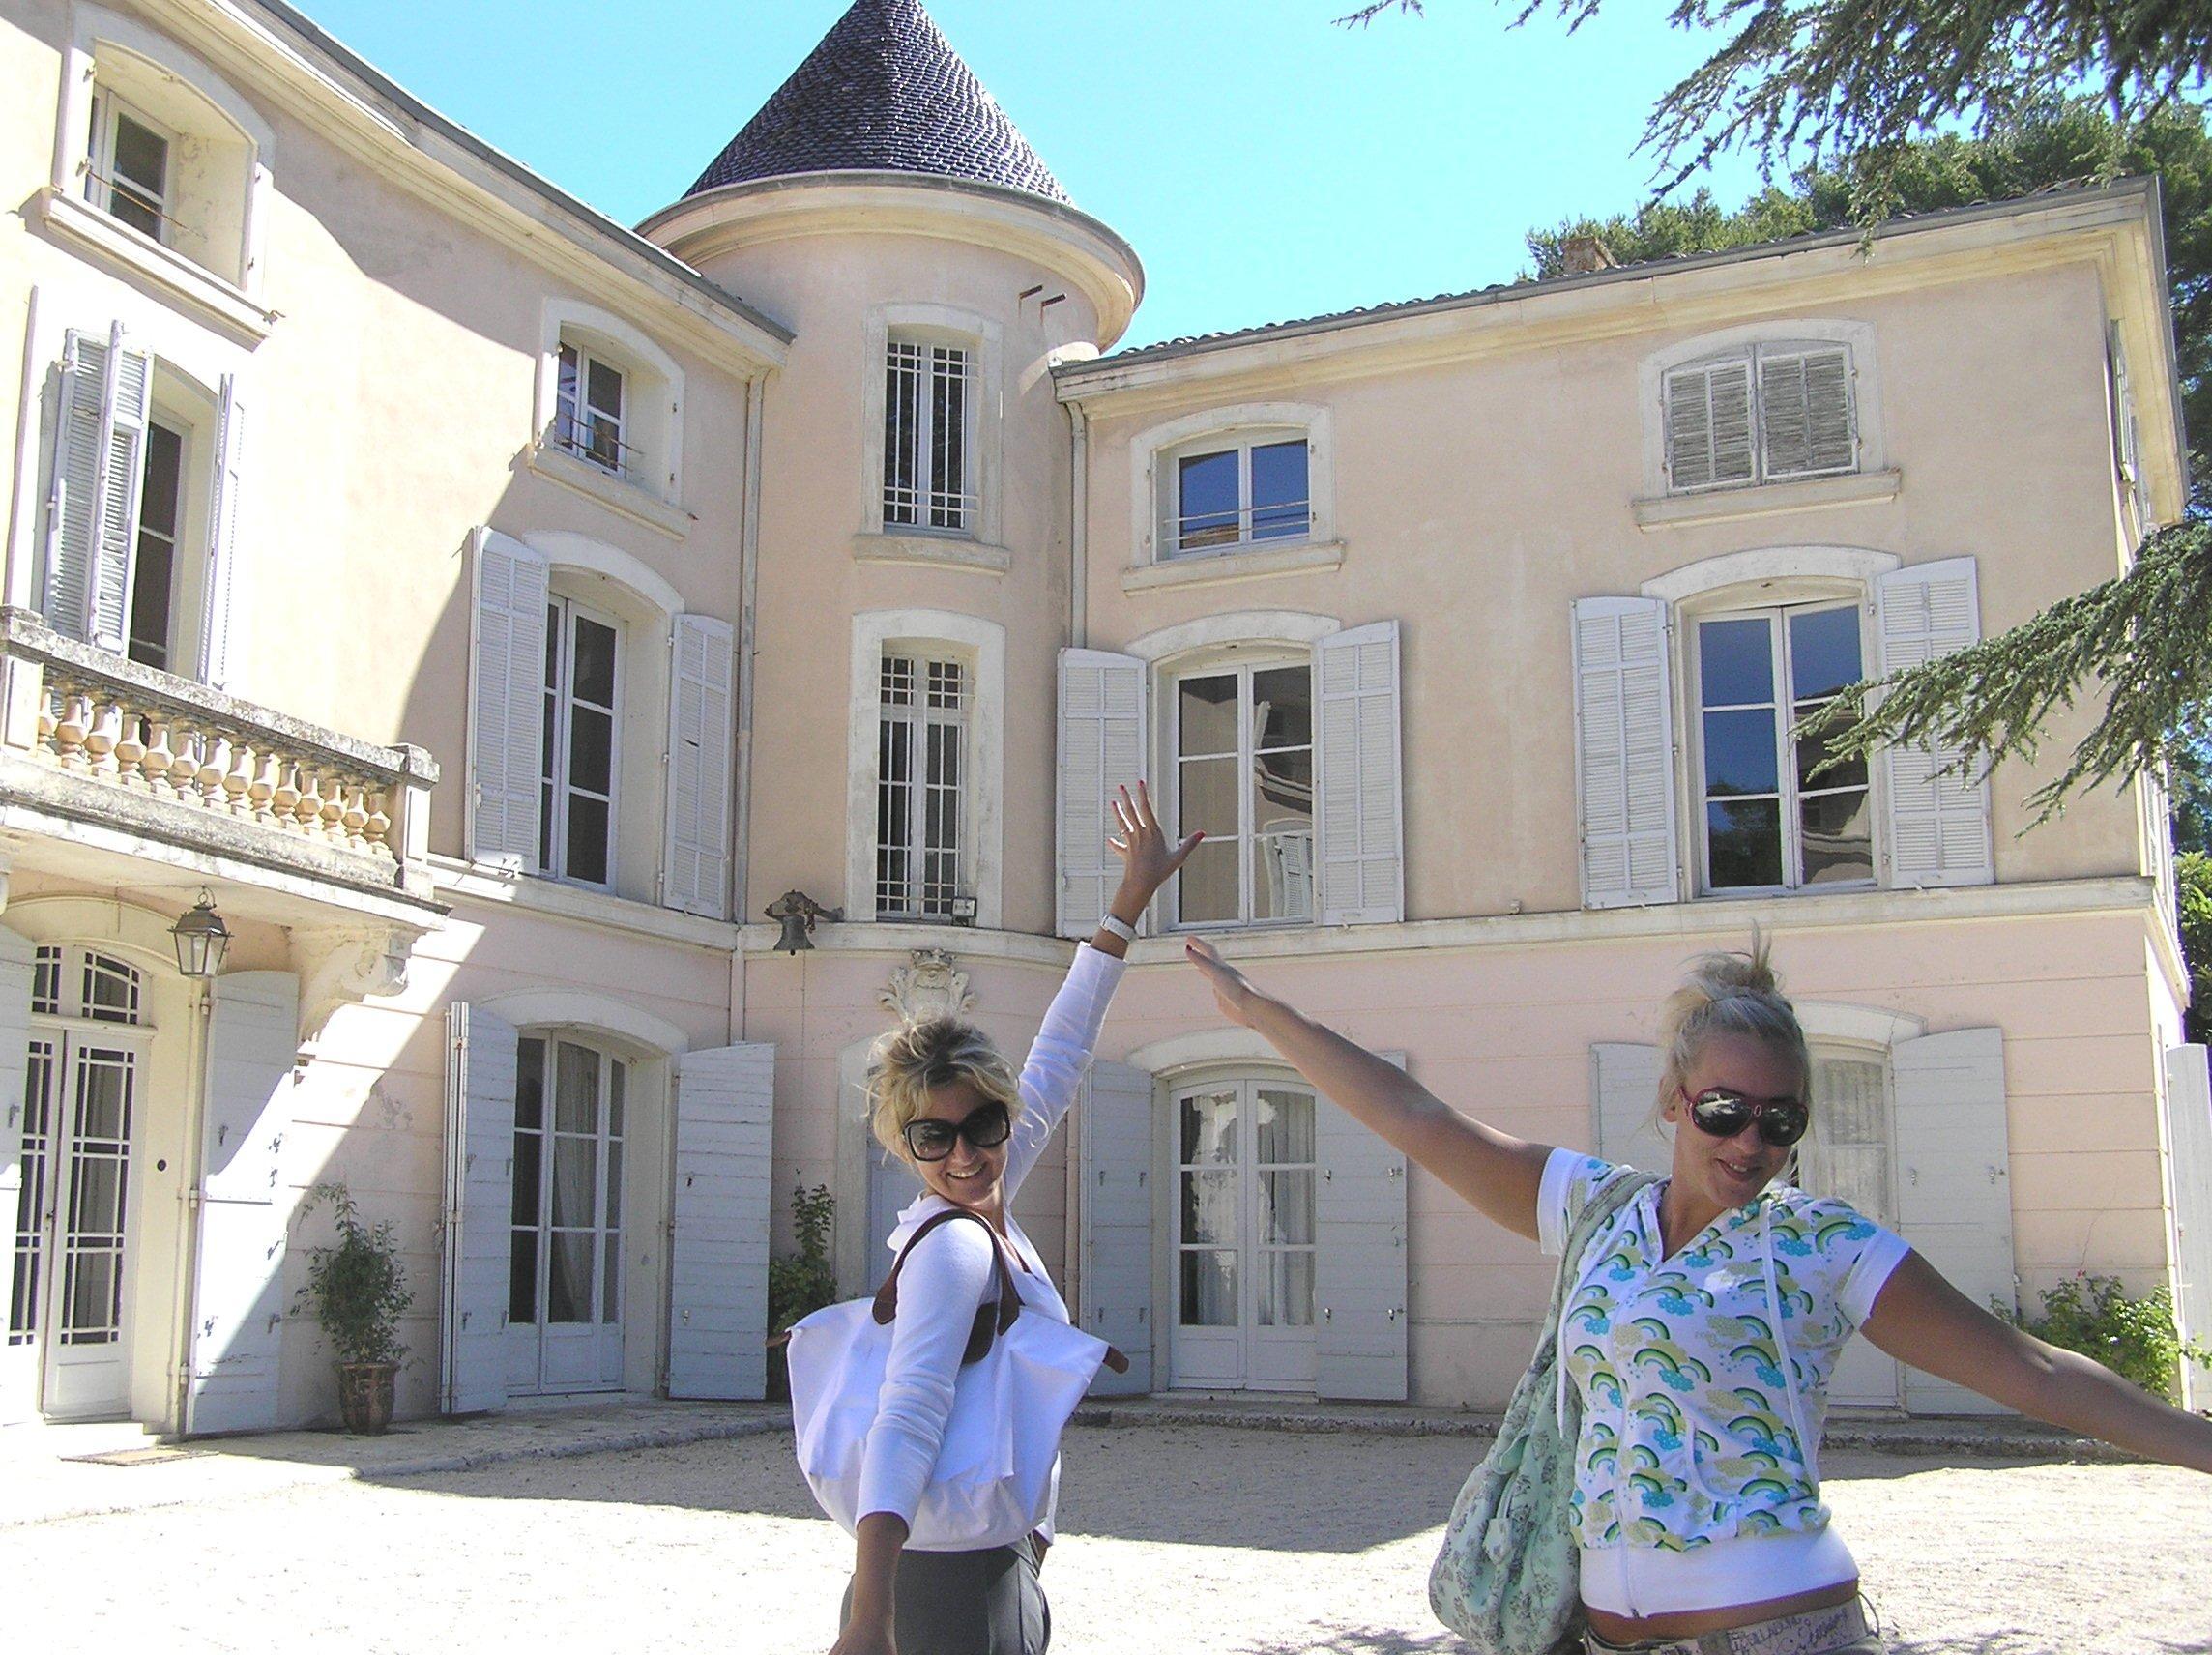 Chateau d'Alpheran